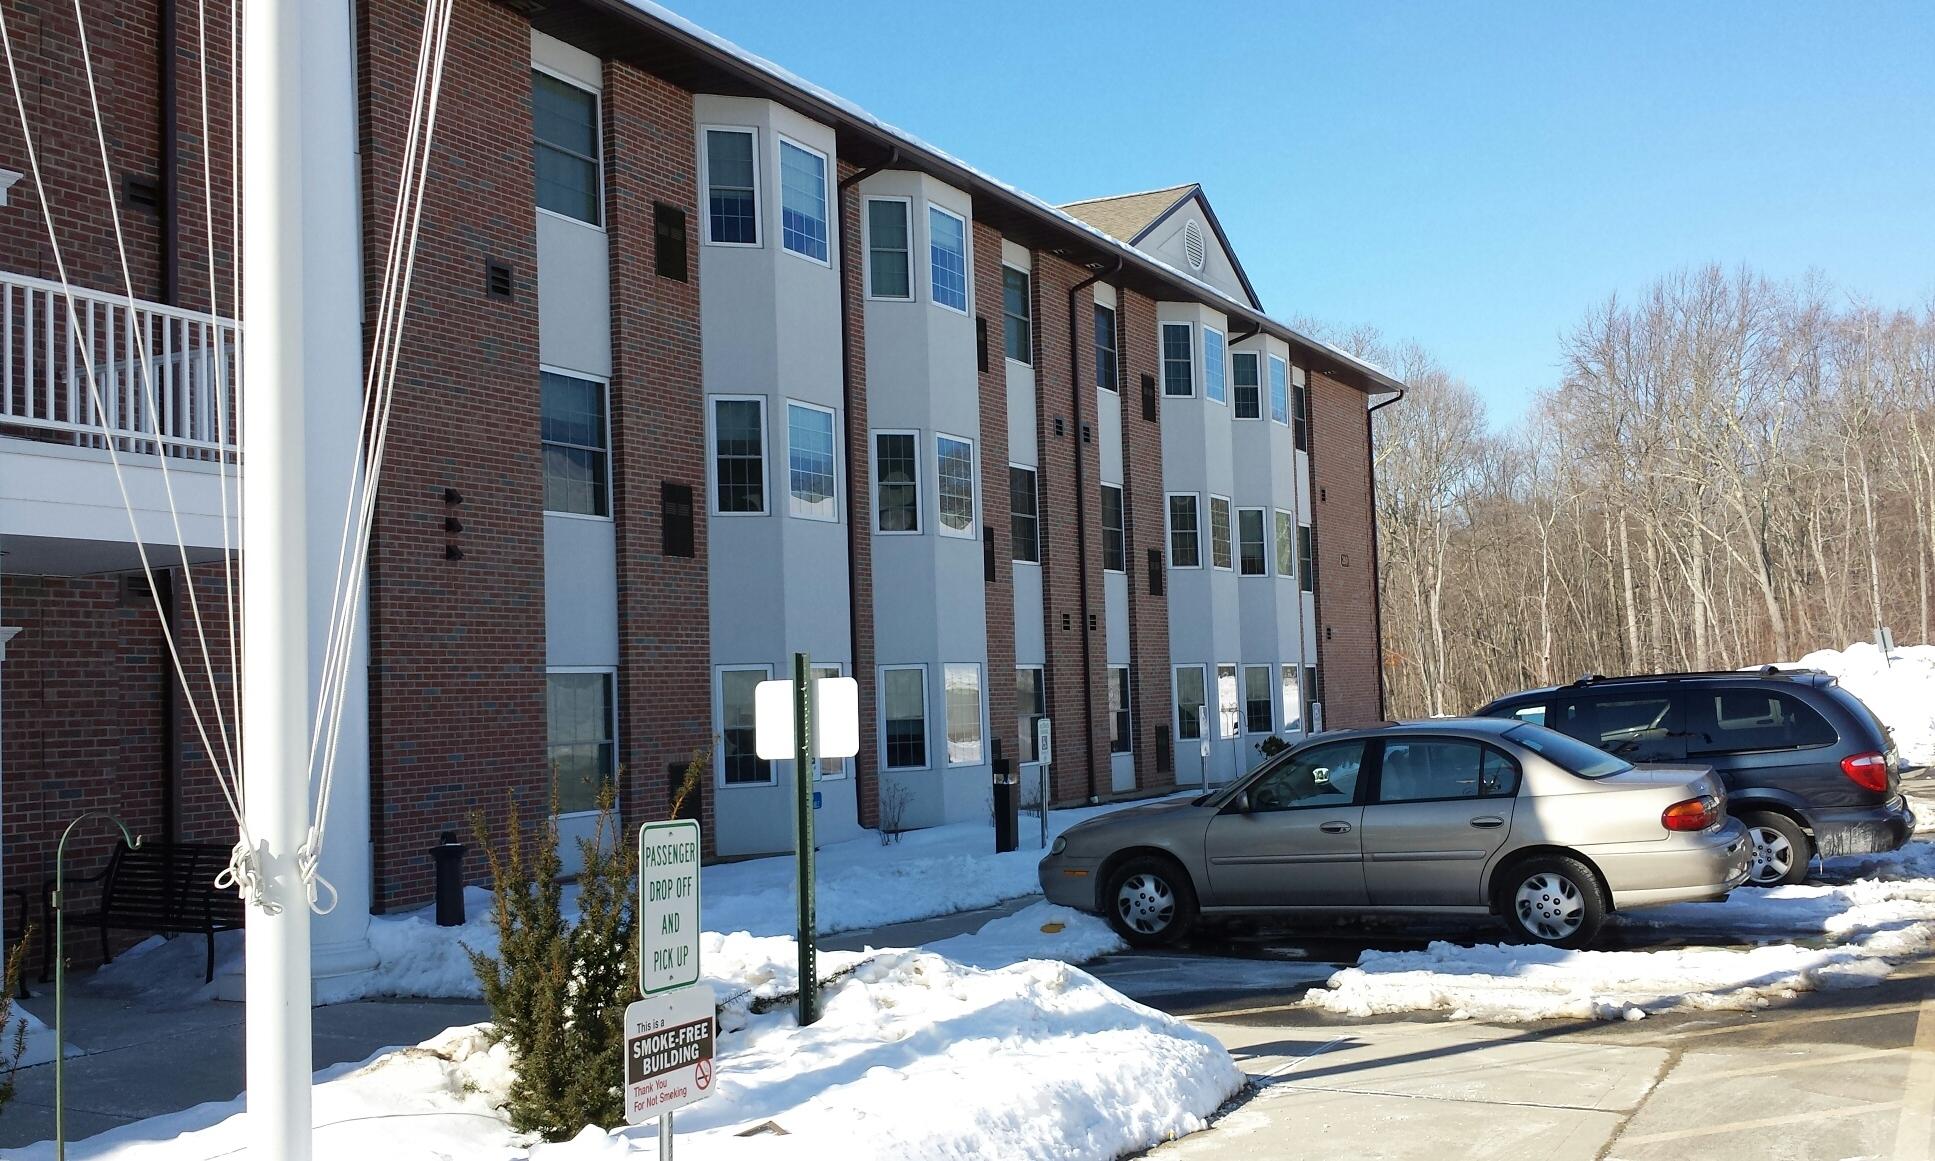 AHEPA 250 V Senior Apartments - 269 Roxbury RoadNiantic, CT 06357(860) 691-3329 TTY: (800) 676-3777 or 711 (English)TTY: (800) 676-4290 or 711 (Español)info@ahepahousing.org